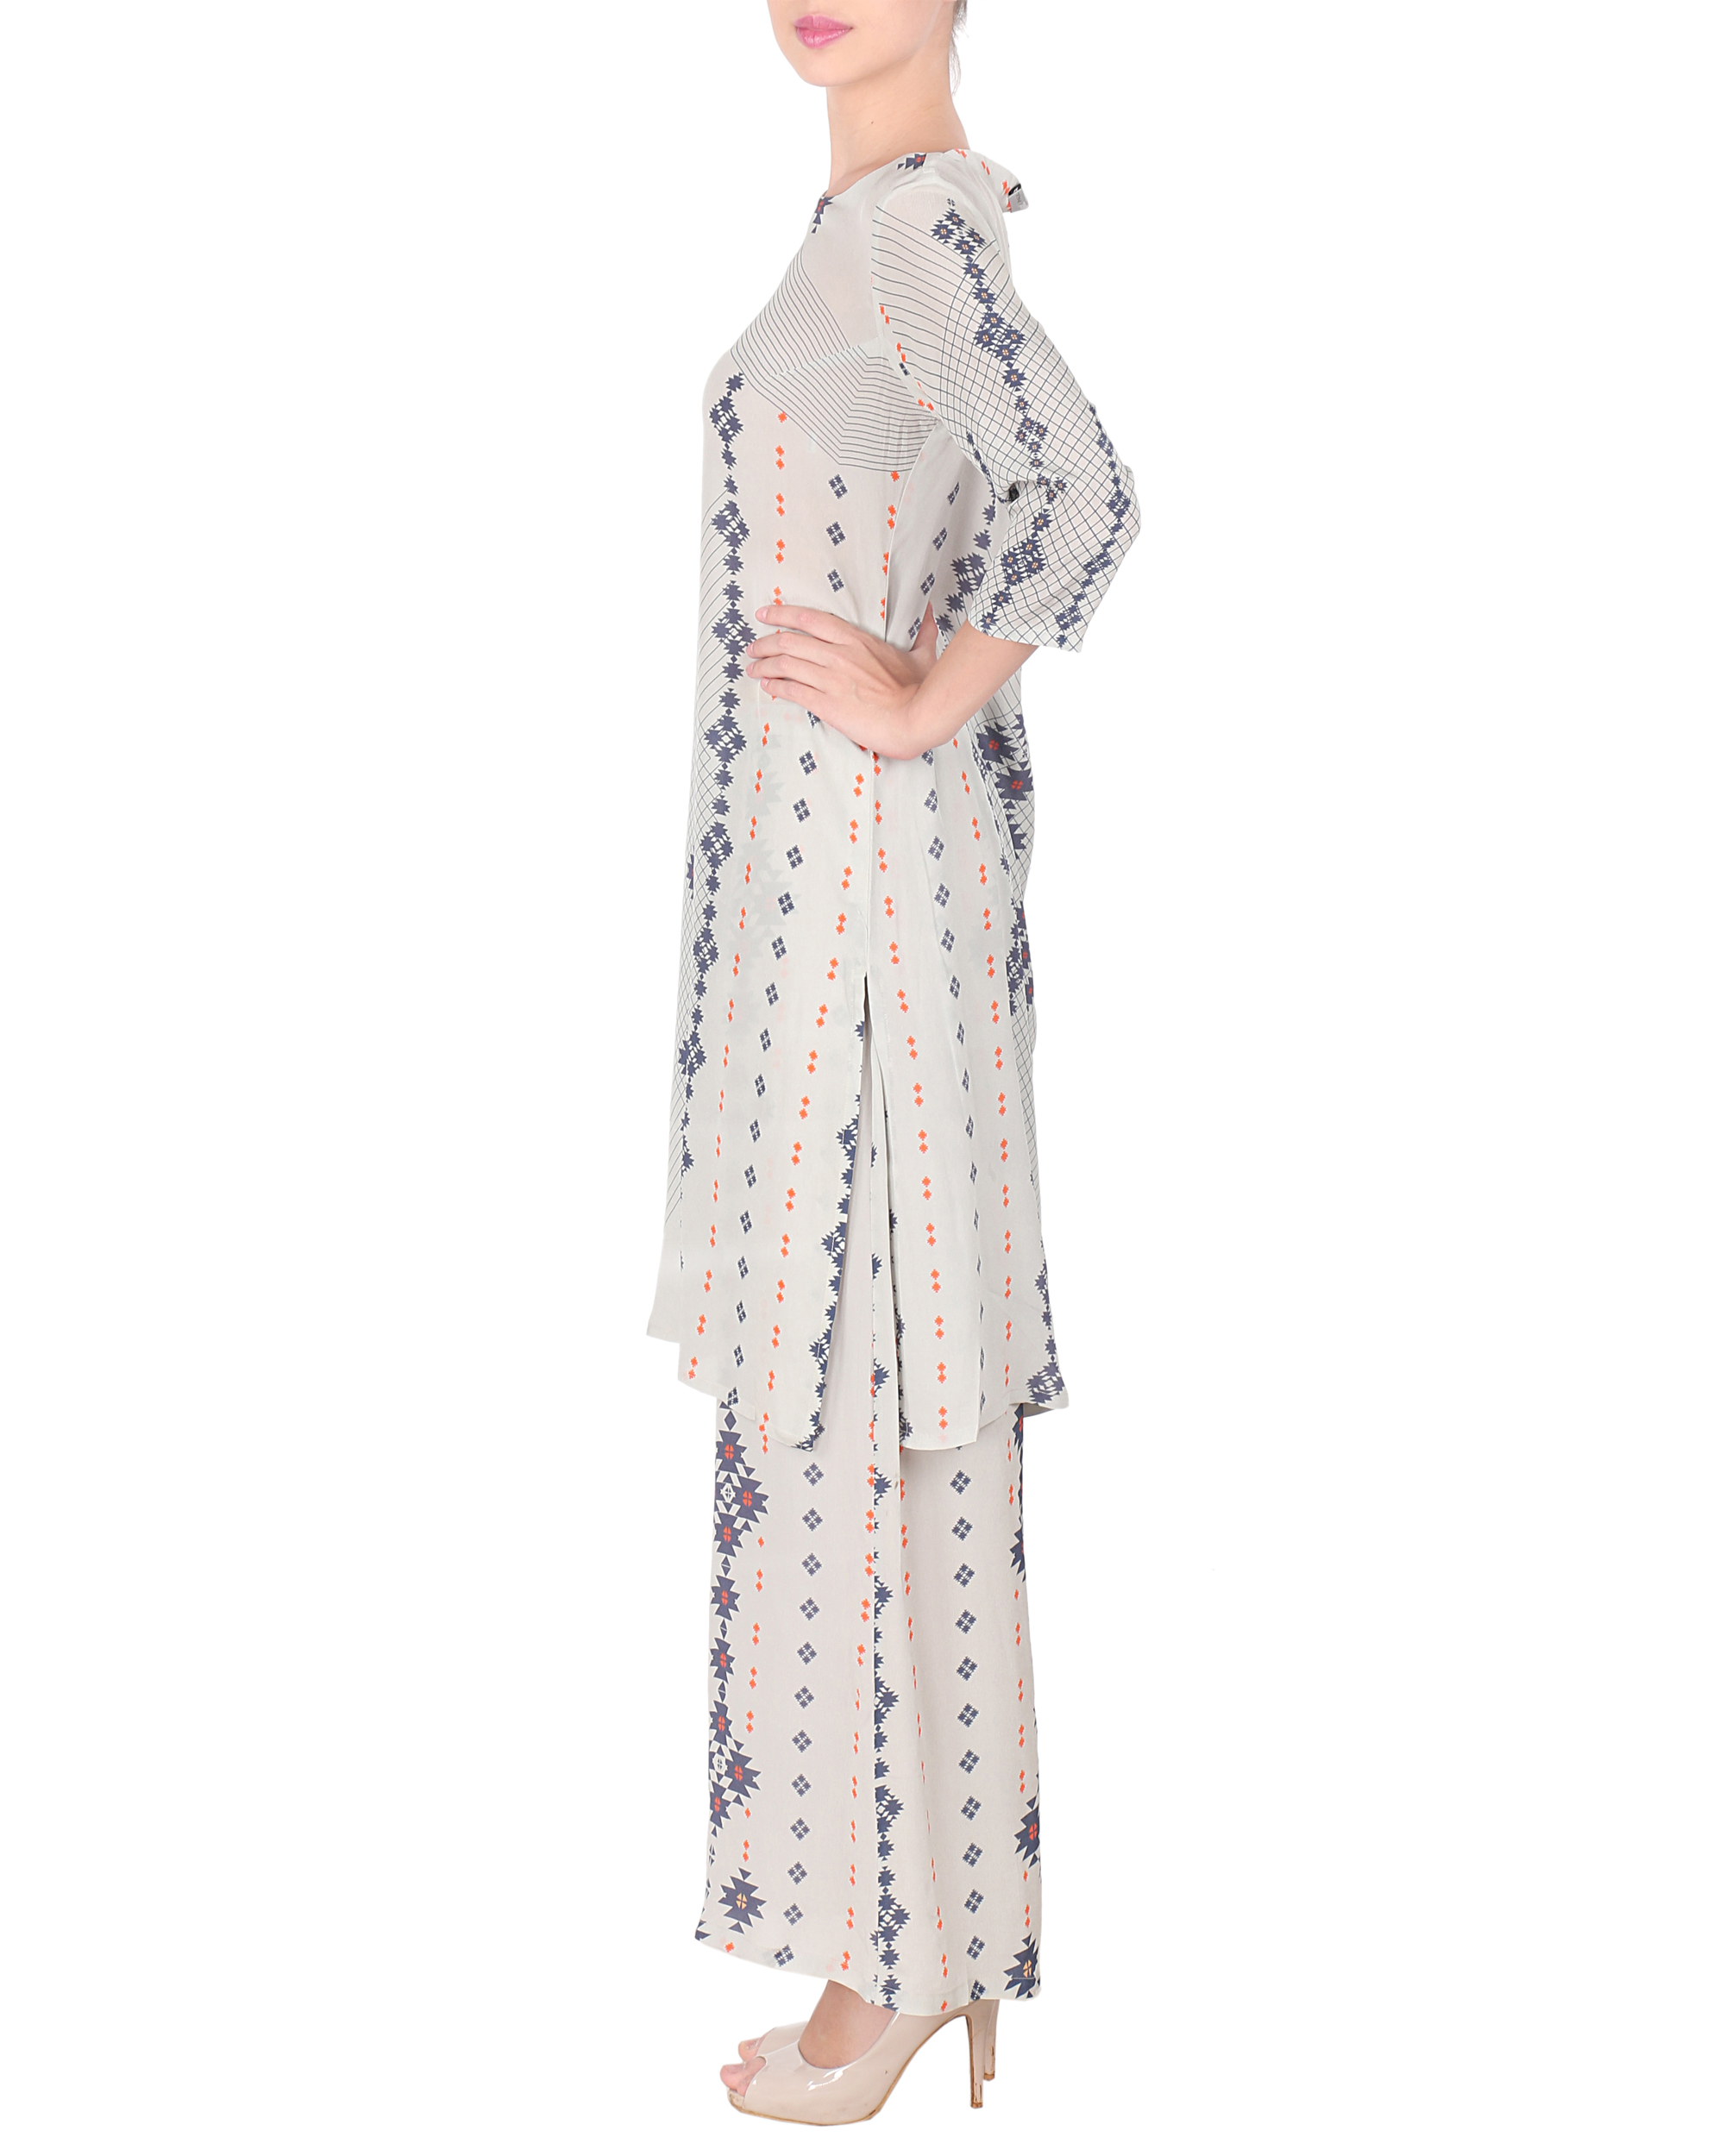 Ihram Kids For Sale Dubai: Long Kurta With Palazzo Pants By Sougat Paul